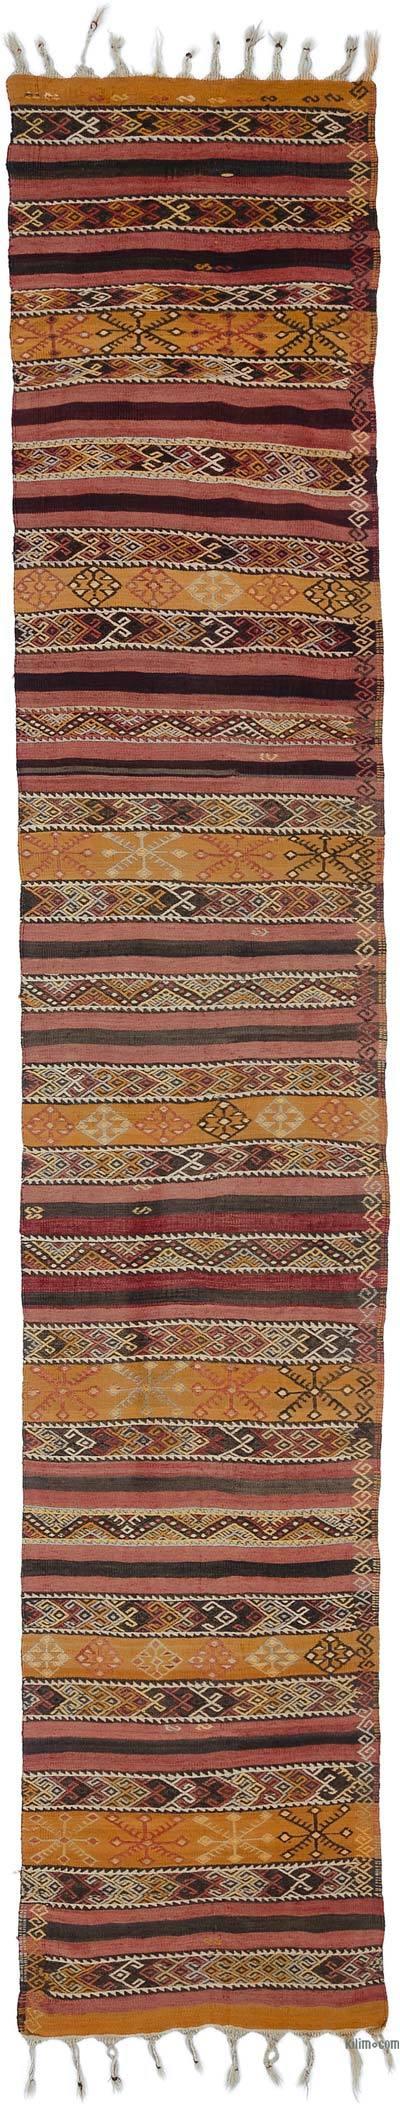 Vintage Malatya Kilim Yolluk - 80 cm x 430 cm